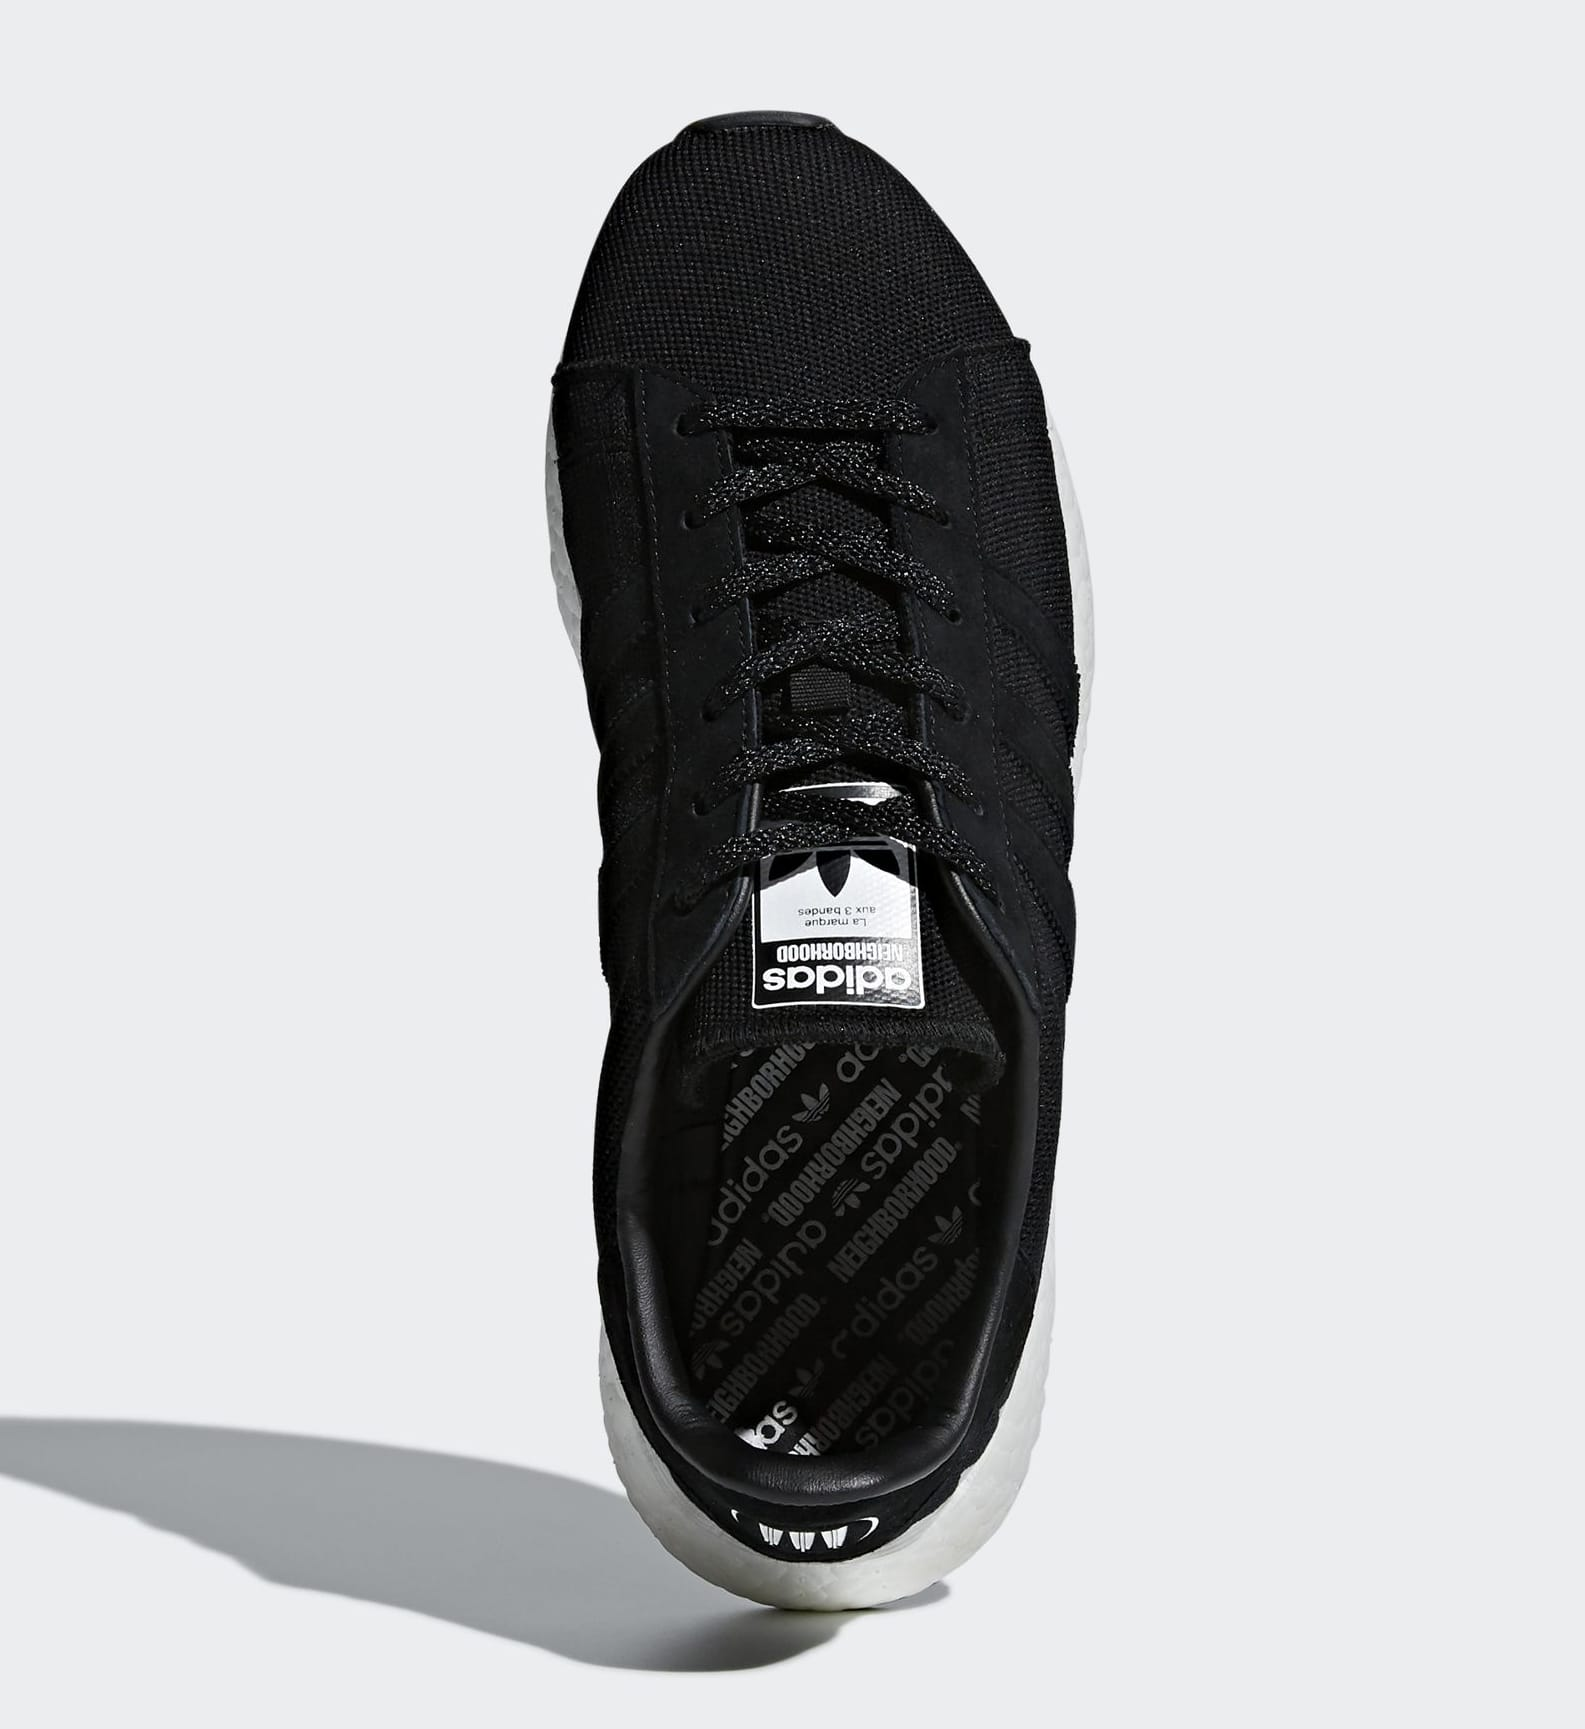 Neighborhood x Adidas Chop Shop DA8839 (Top)